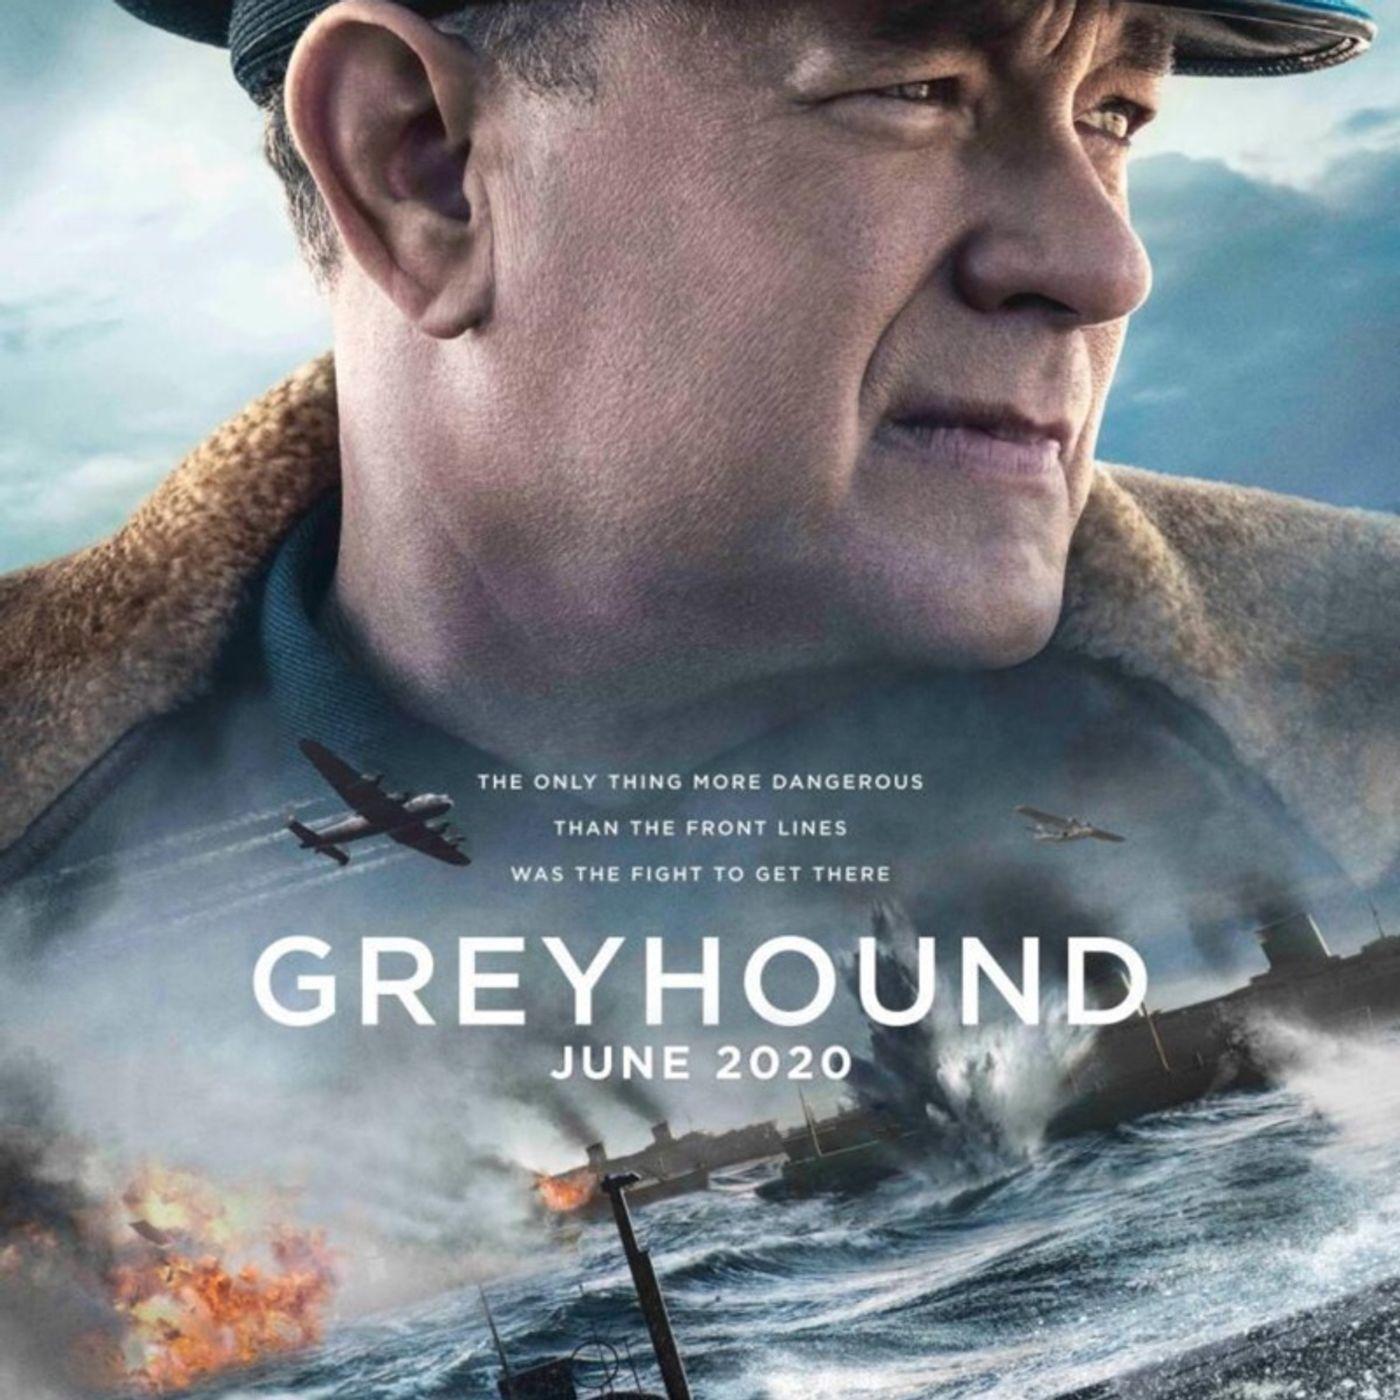 Greyhound the Movie and Prayer Image